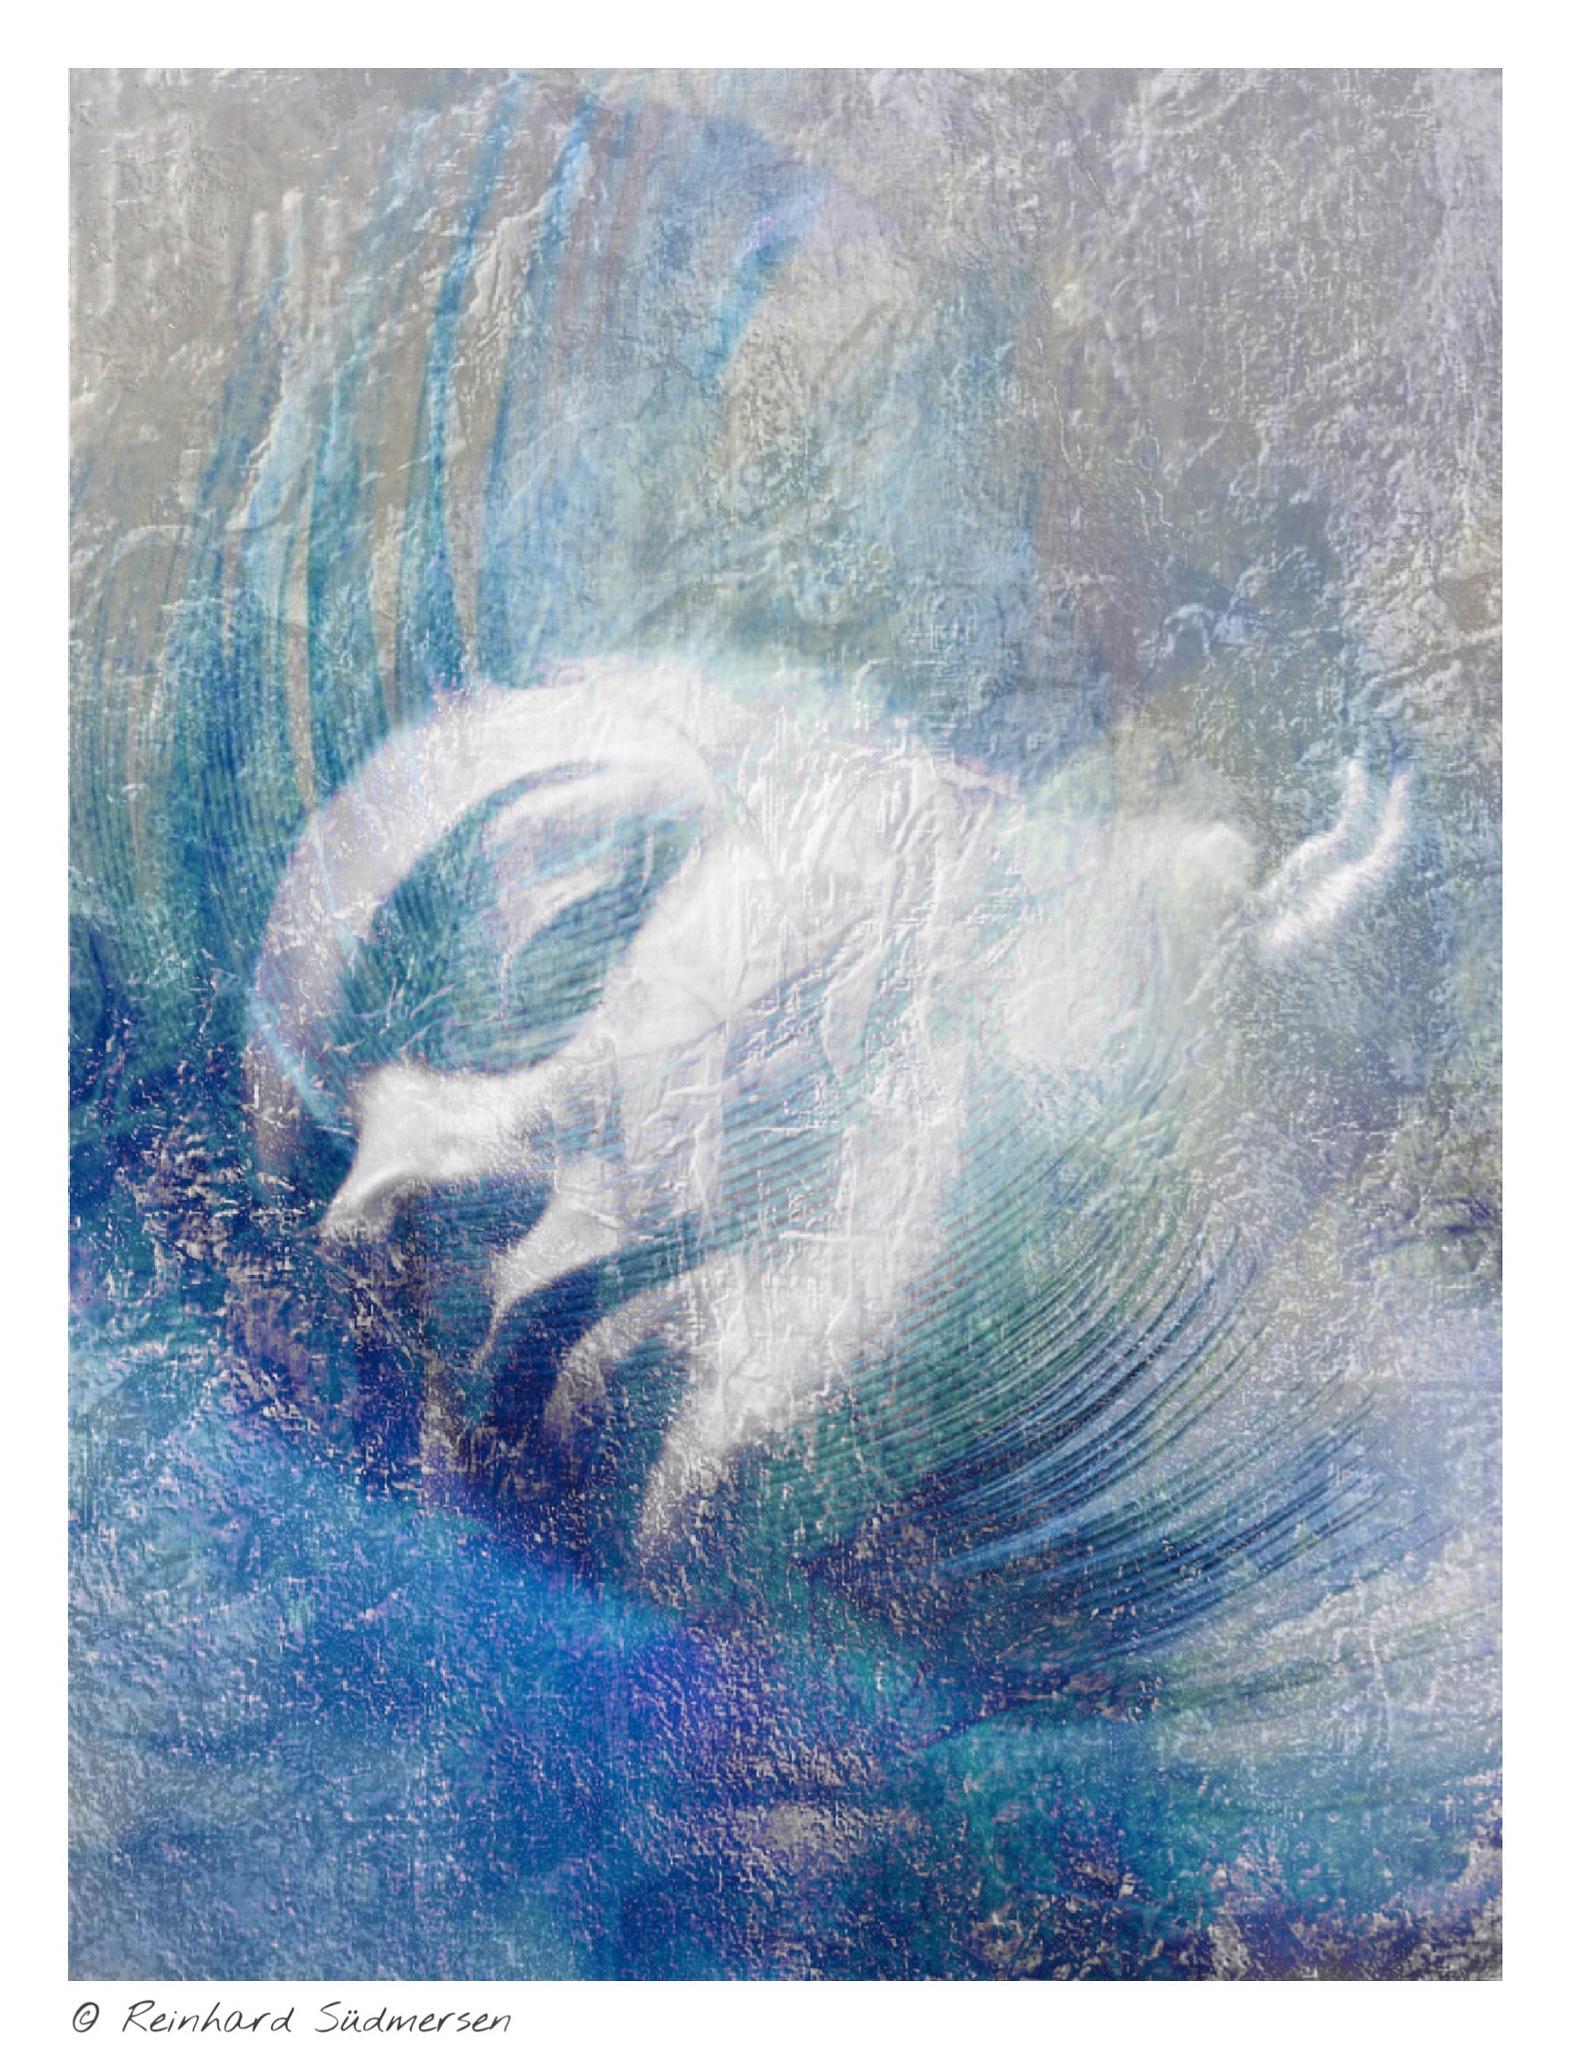 DREAMLESS SLEEP by Reinhard Südmersen